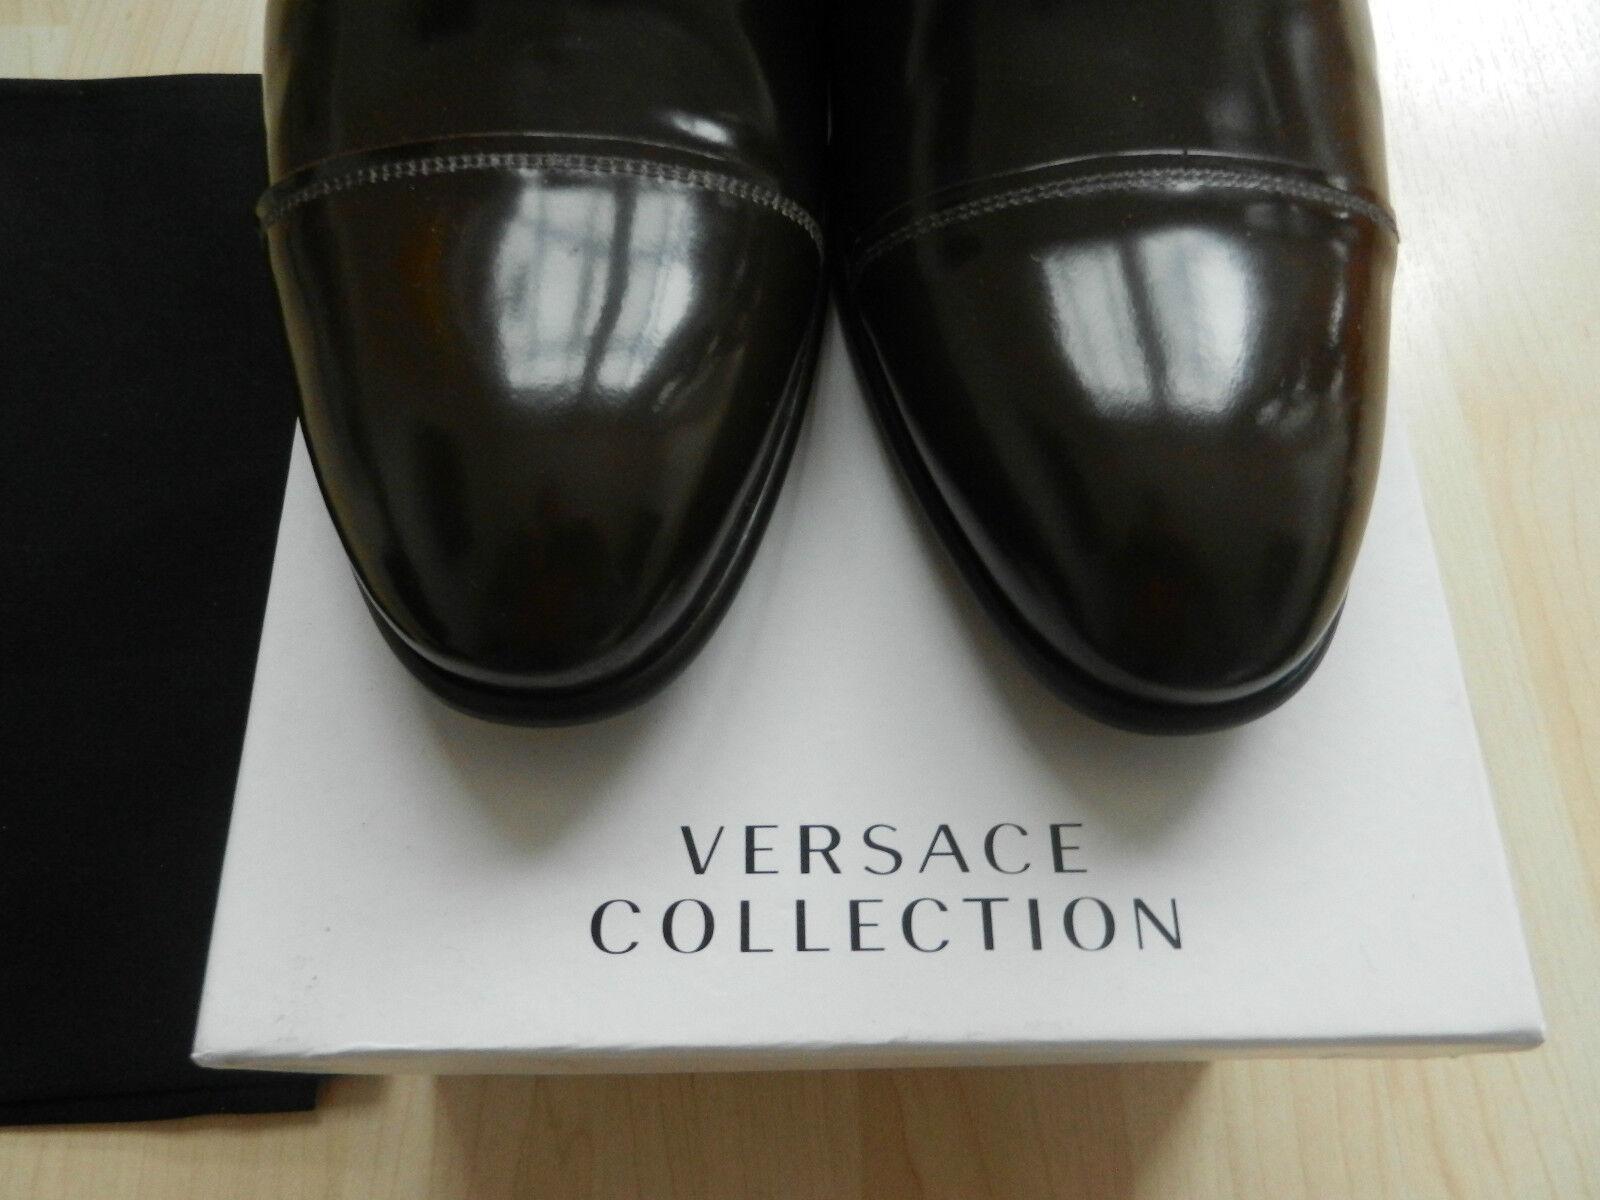 Versace Herrenhalbschuh Gr. 43 braun Neu  Originalware keine B-Ware Neu braun 50% unter NP 25f924